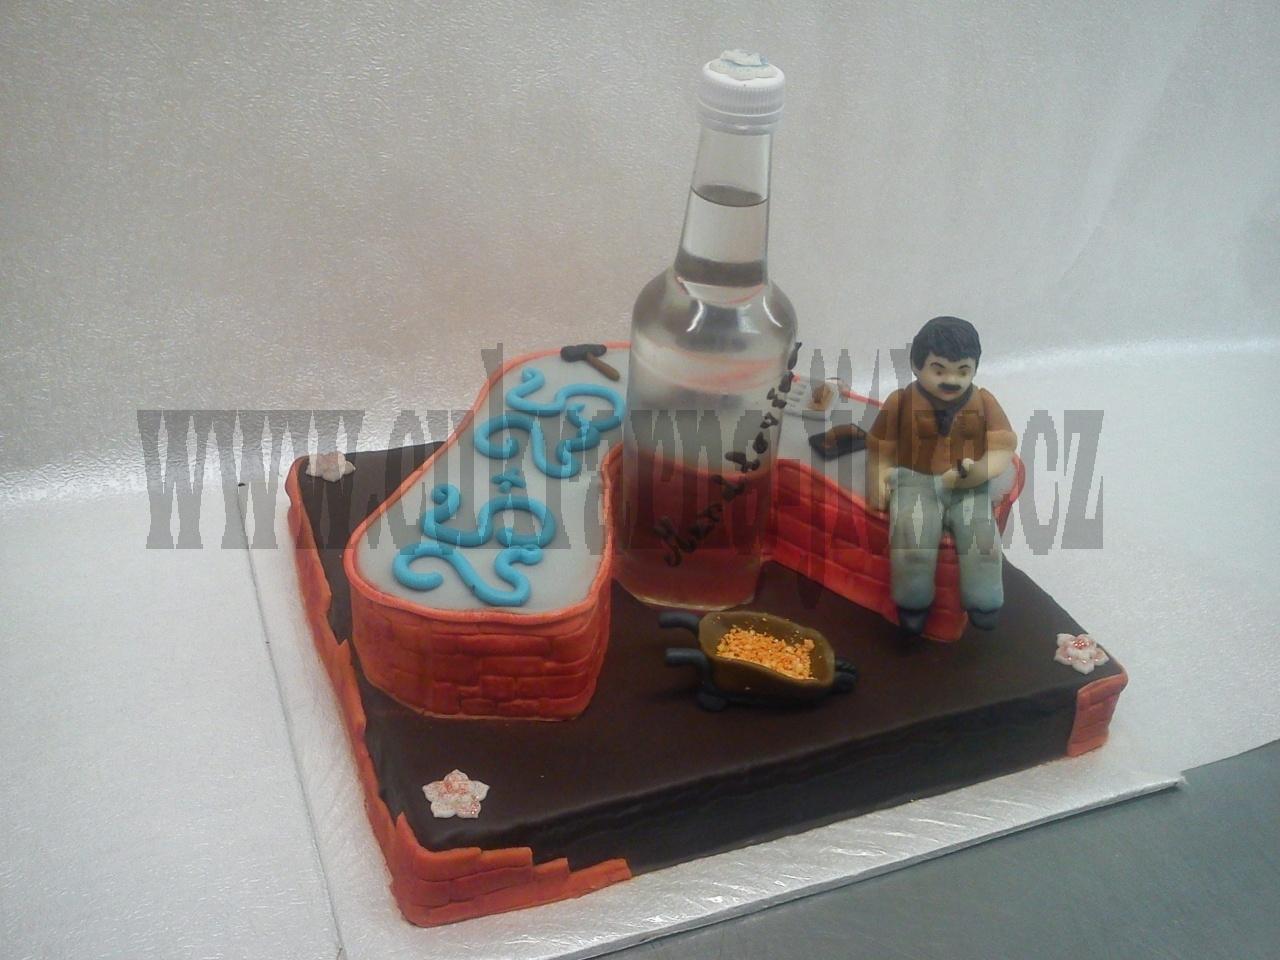 dort pro obkladače- zedníka s flaškou mandlovice č.707